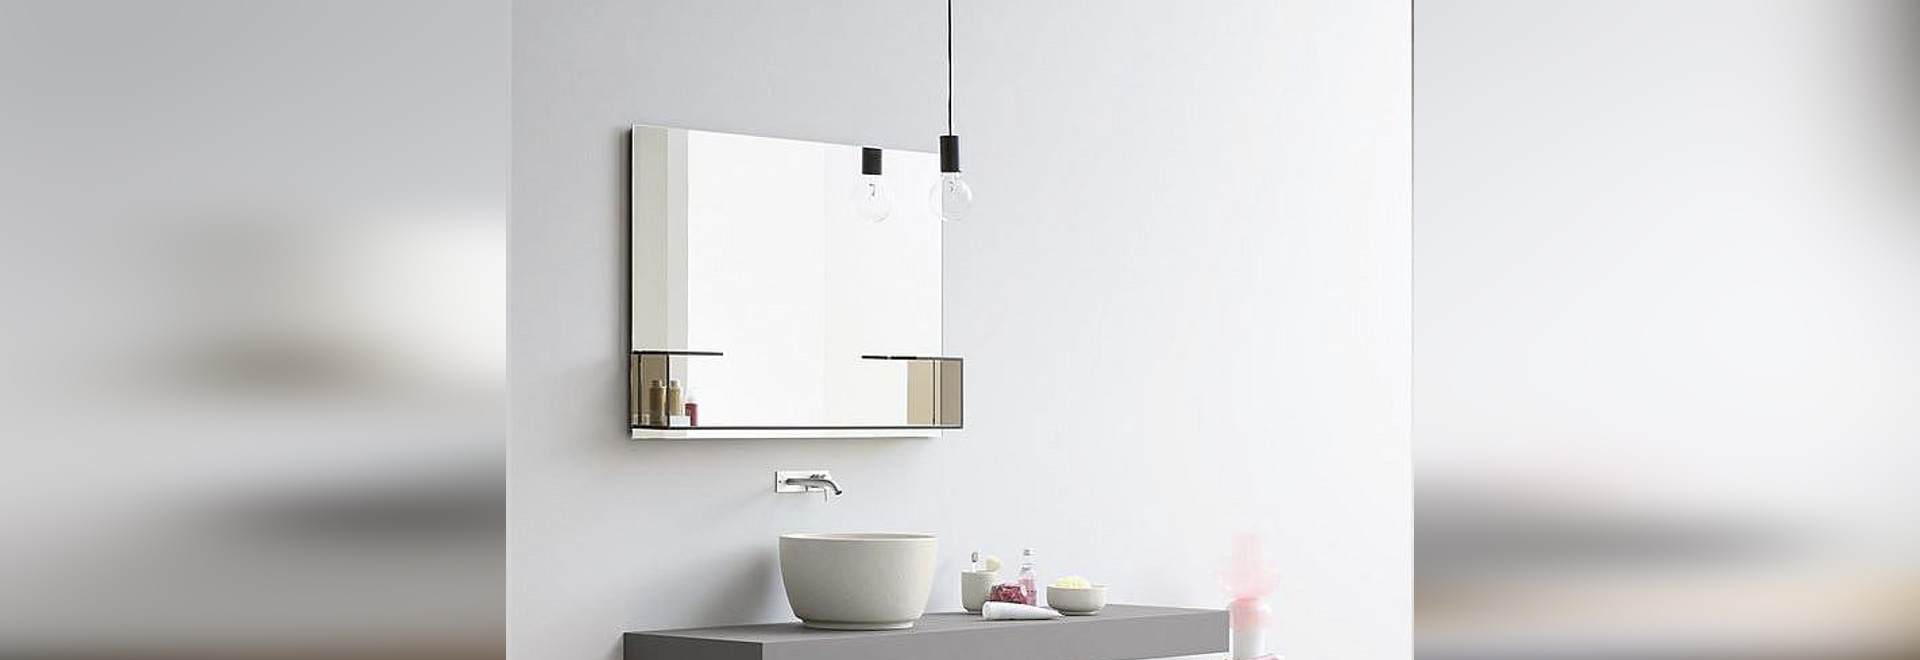 COLLECTION MOODE - Design Monica Graffeo - washbasin cabinet